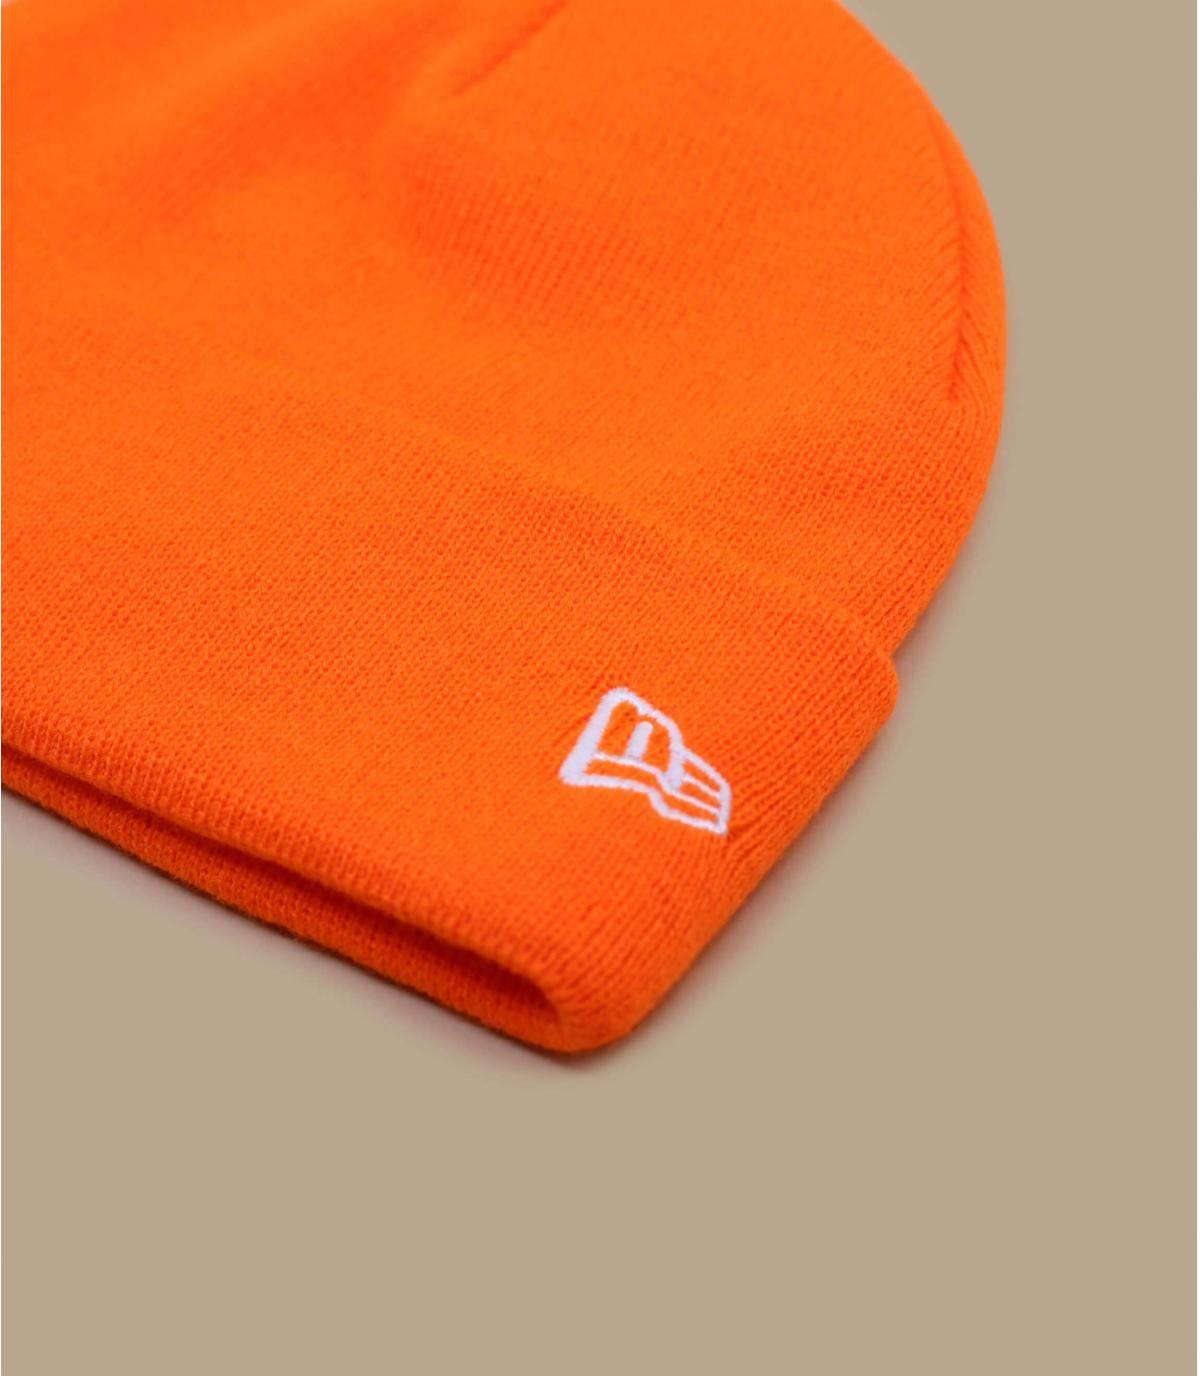 Detalles Pop Short Cuff orange imagen 3